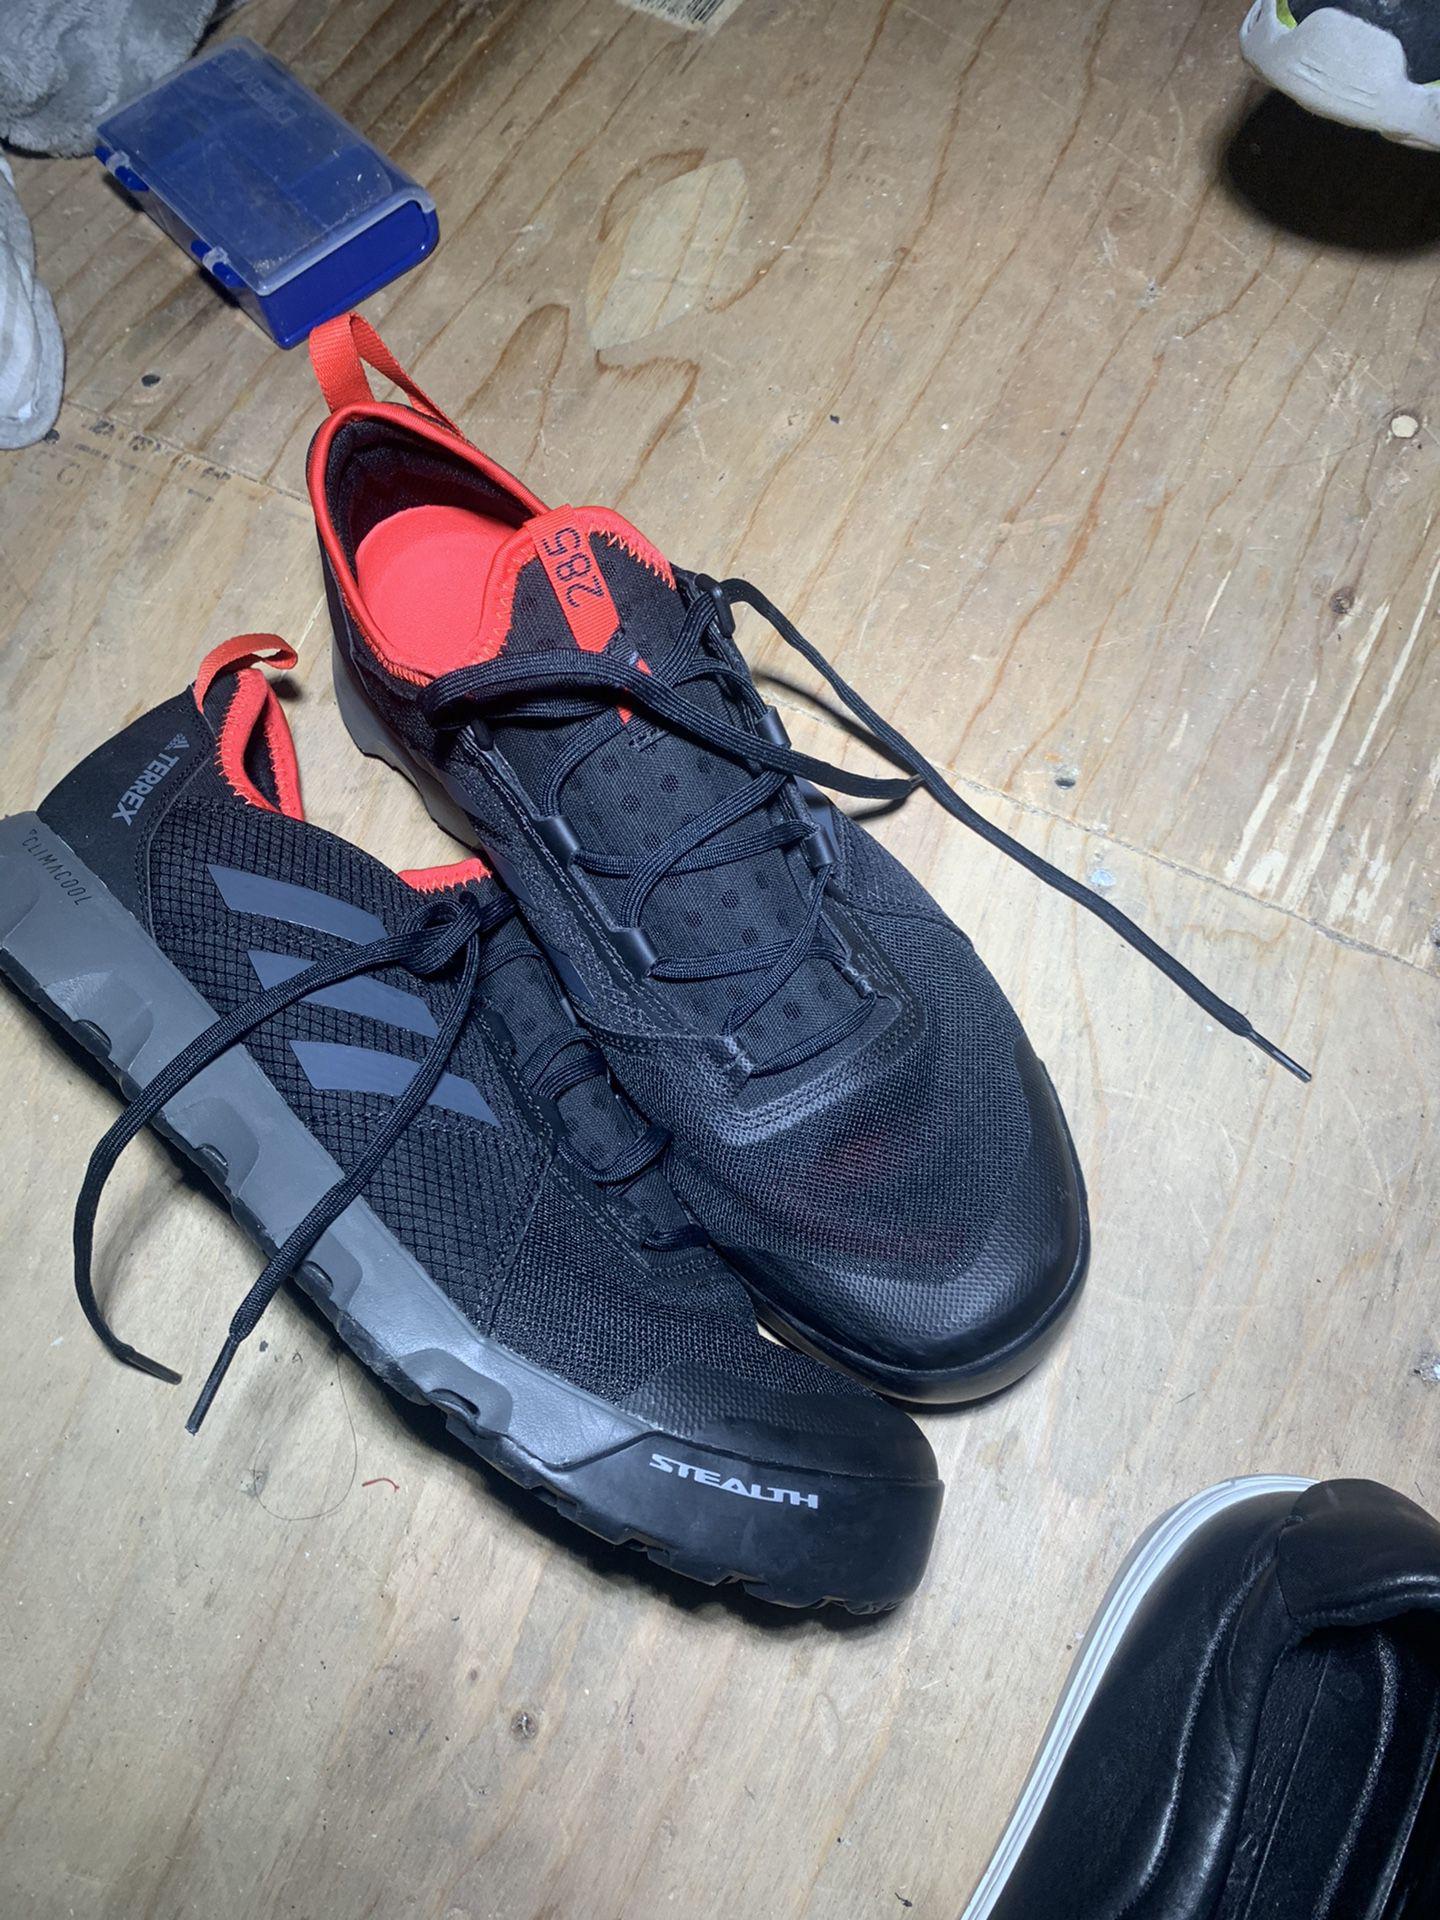 Adidas Stealth Size 10